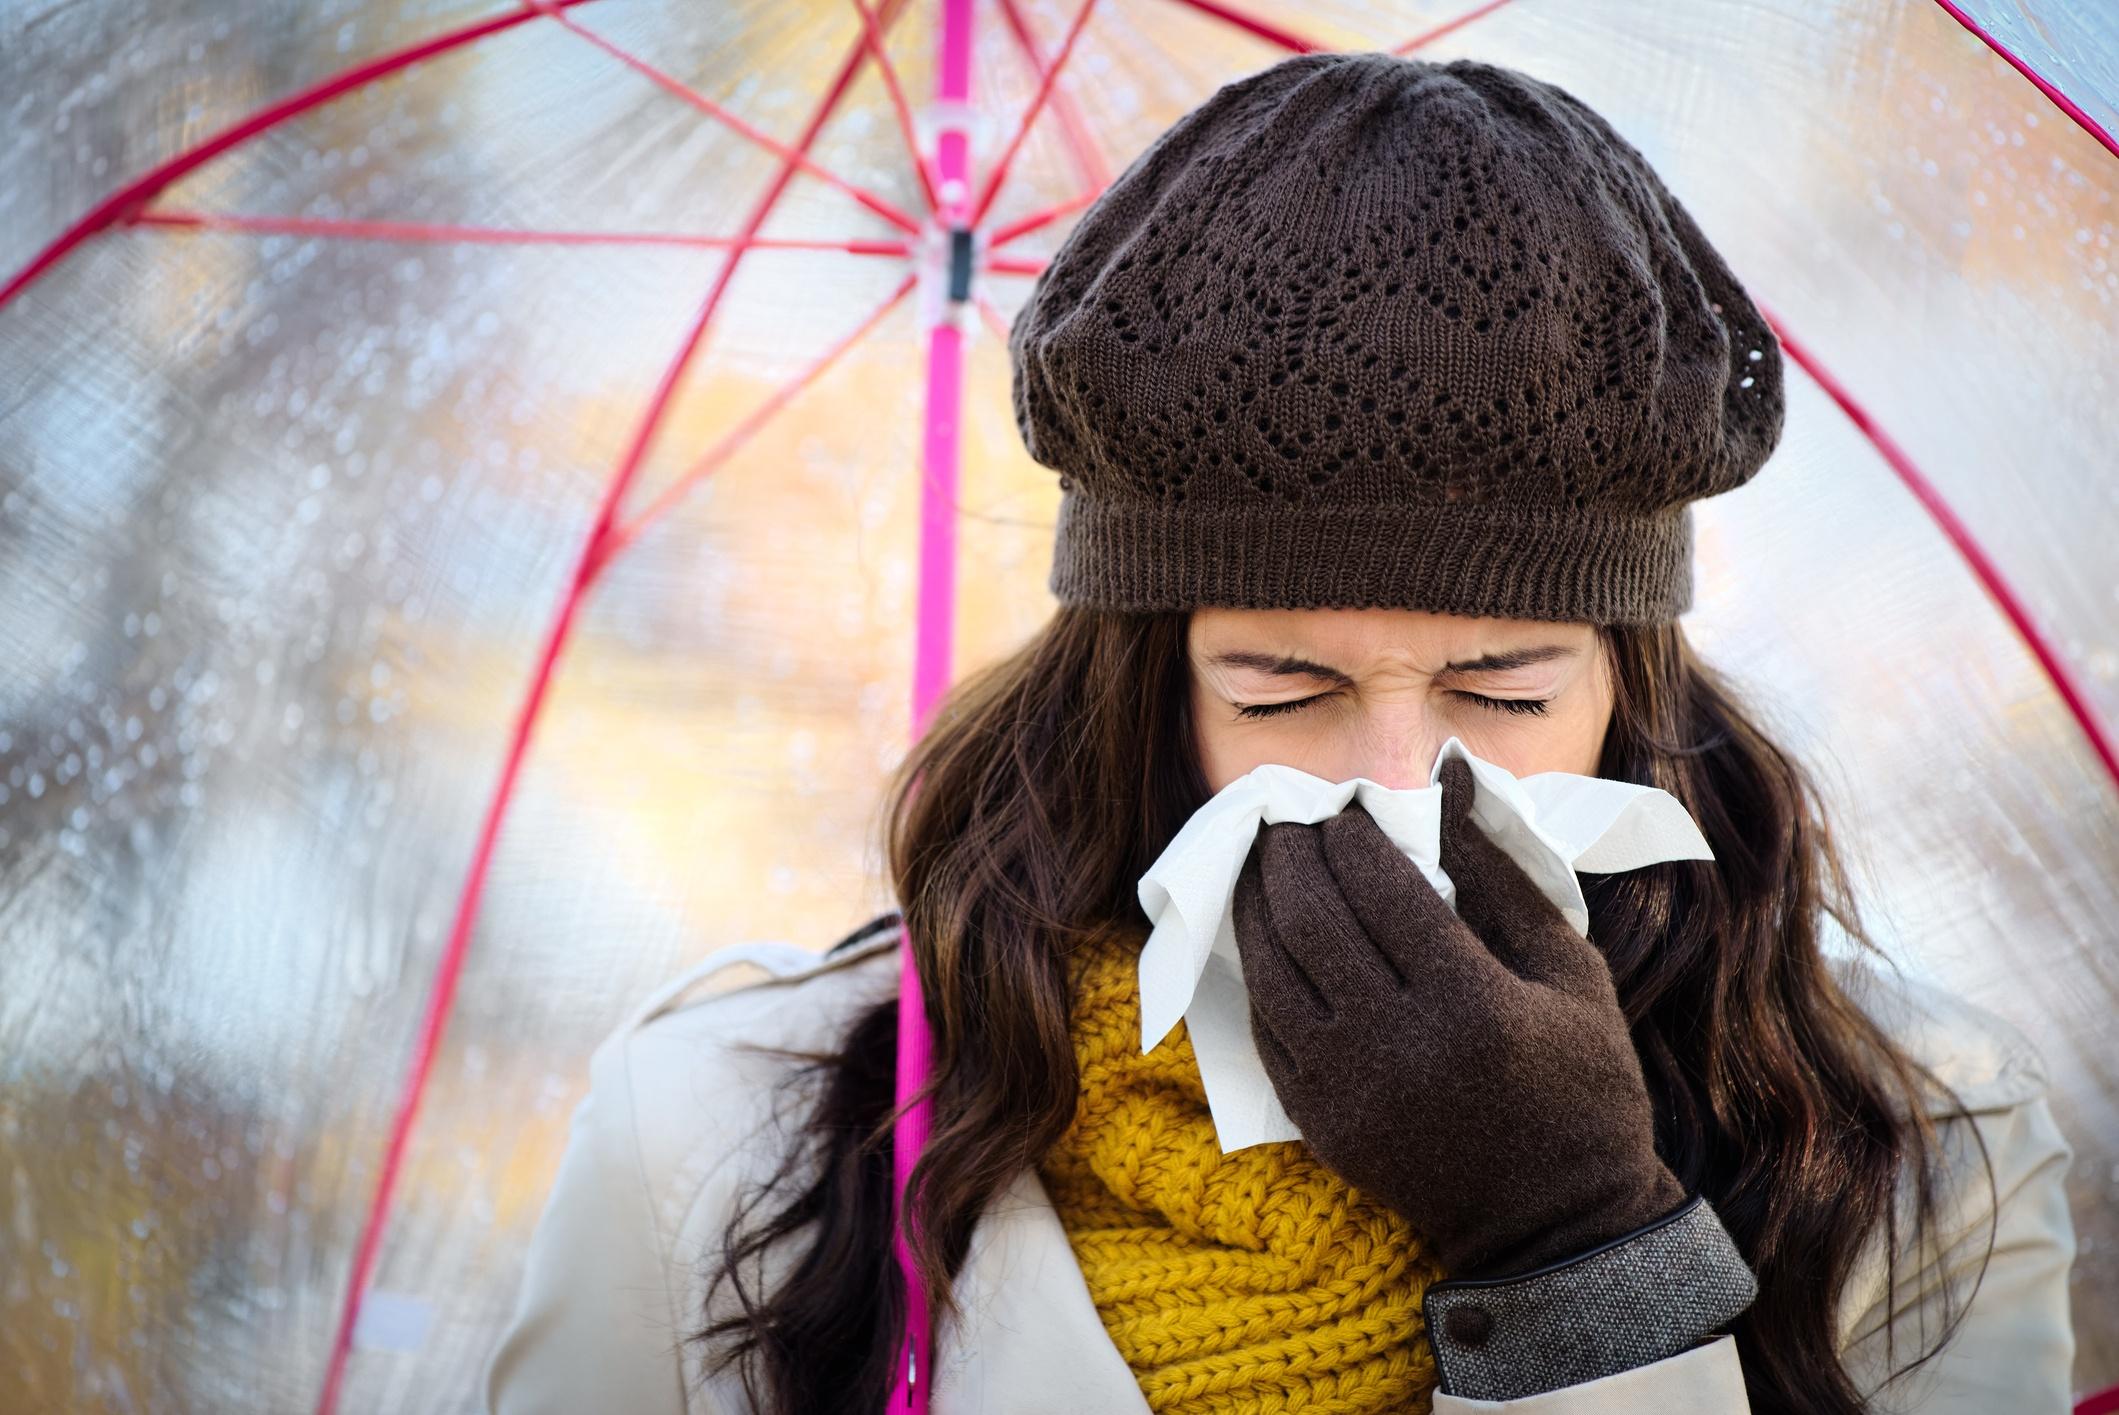 woman-coughing-underneath-umbrella-richmond-va-weather